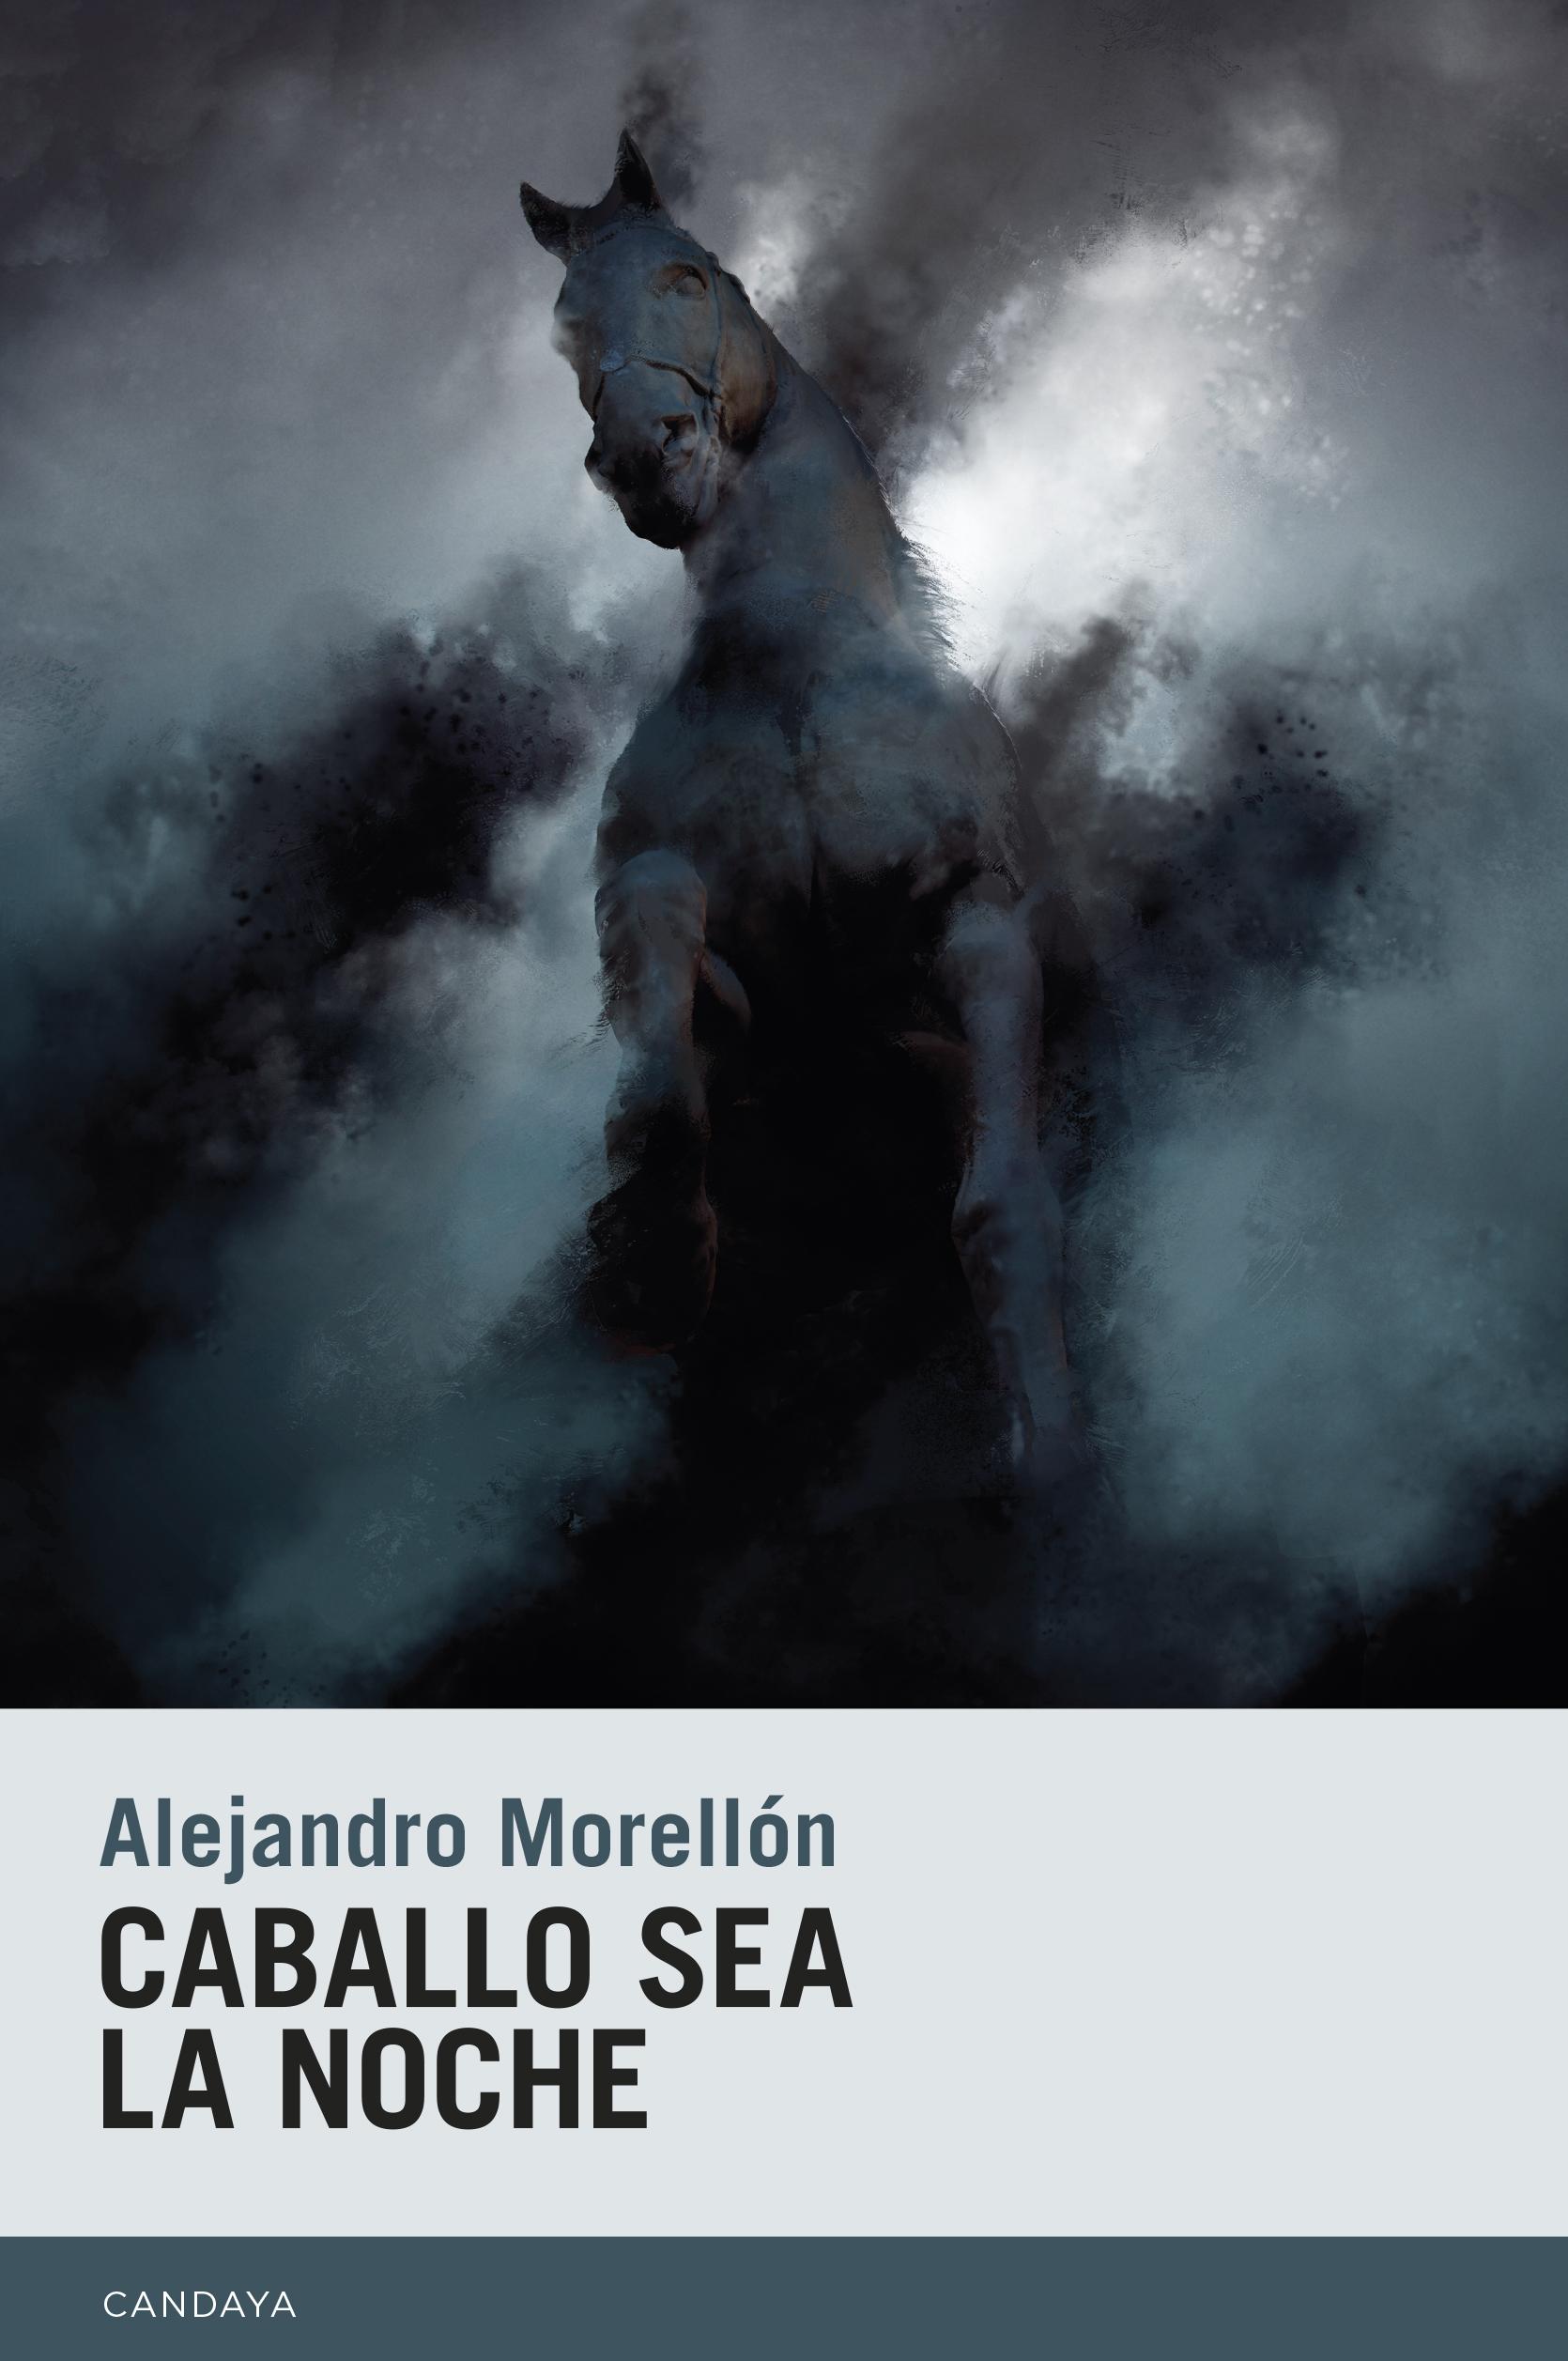 Caballo sea la noche de Alejandro Morellón